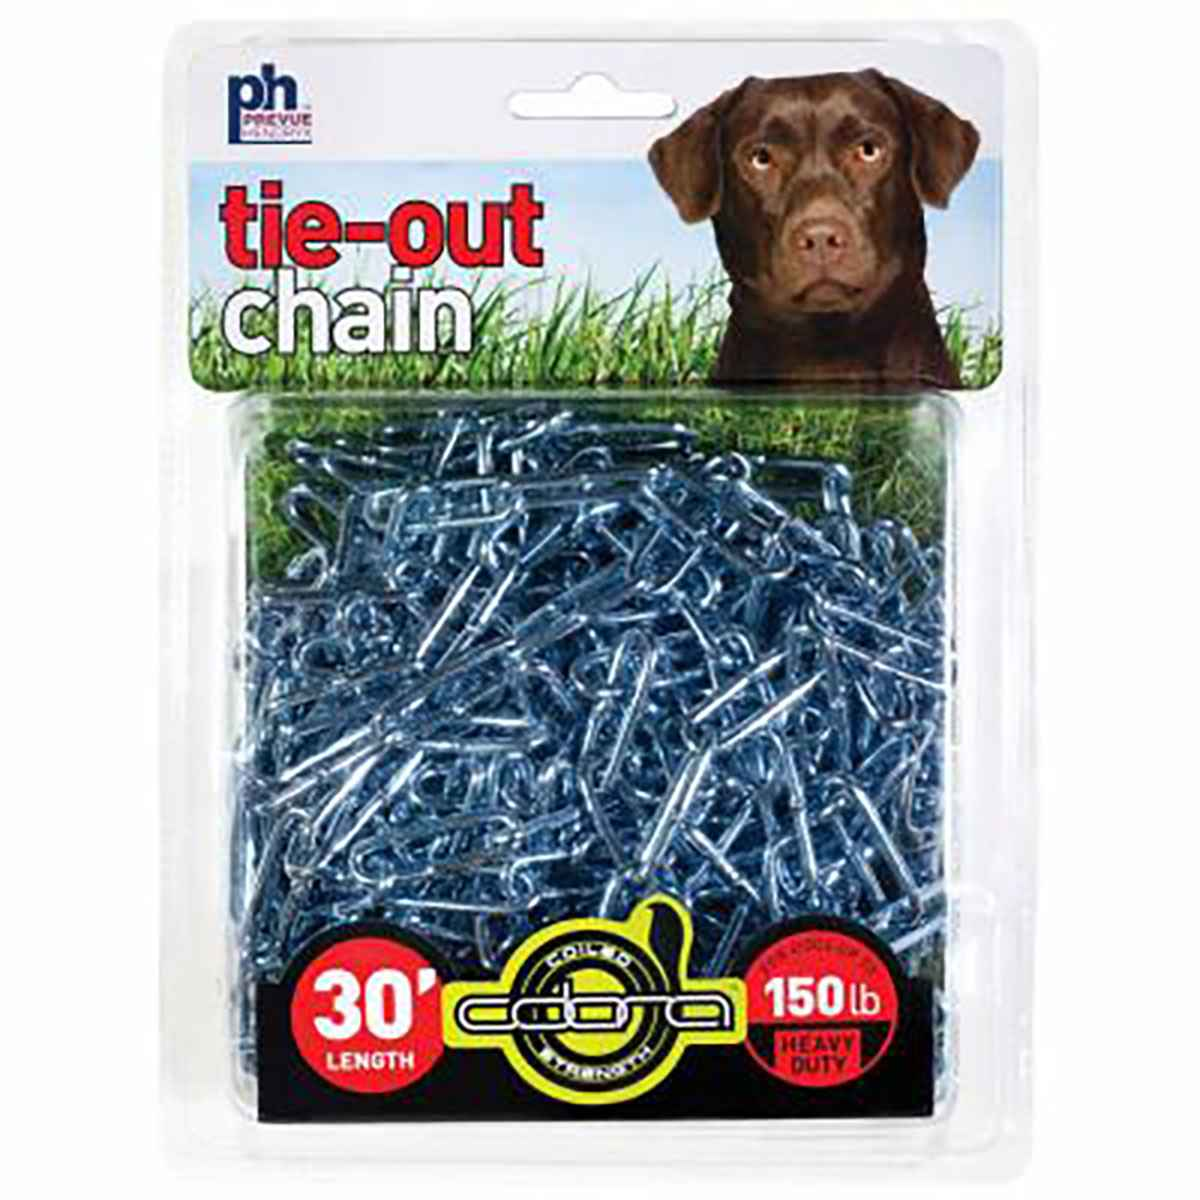 Prevue Pet 3.8mm x 30 Tie Out Chain' - 2126